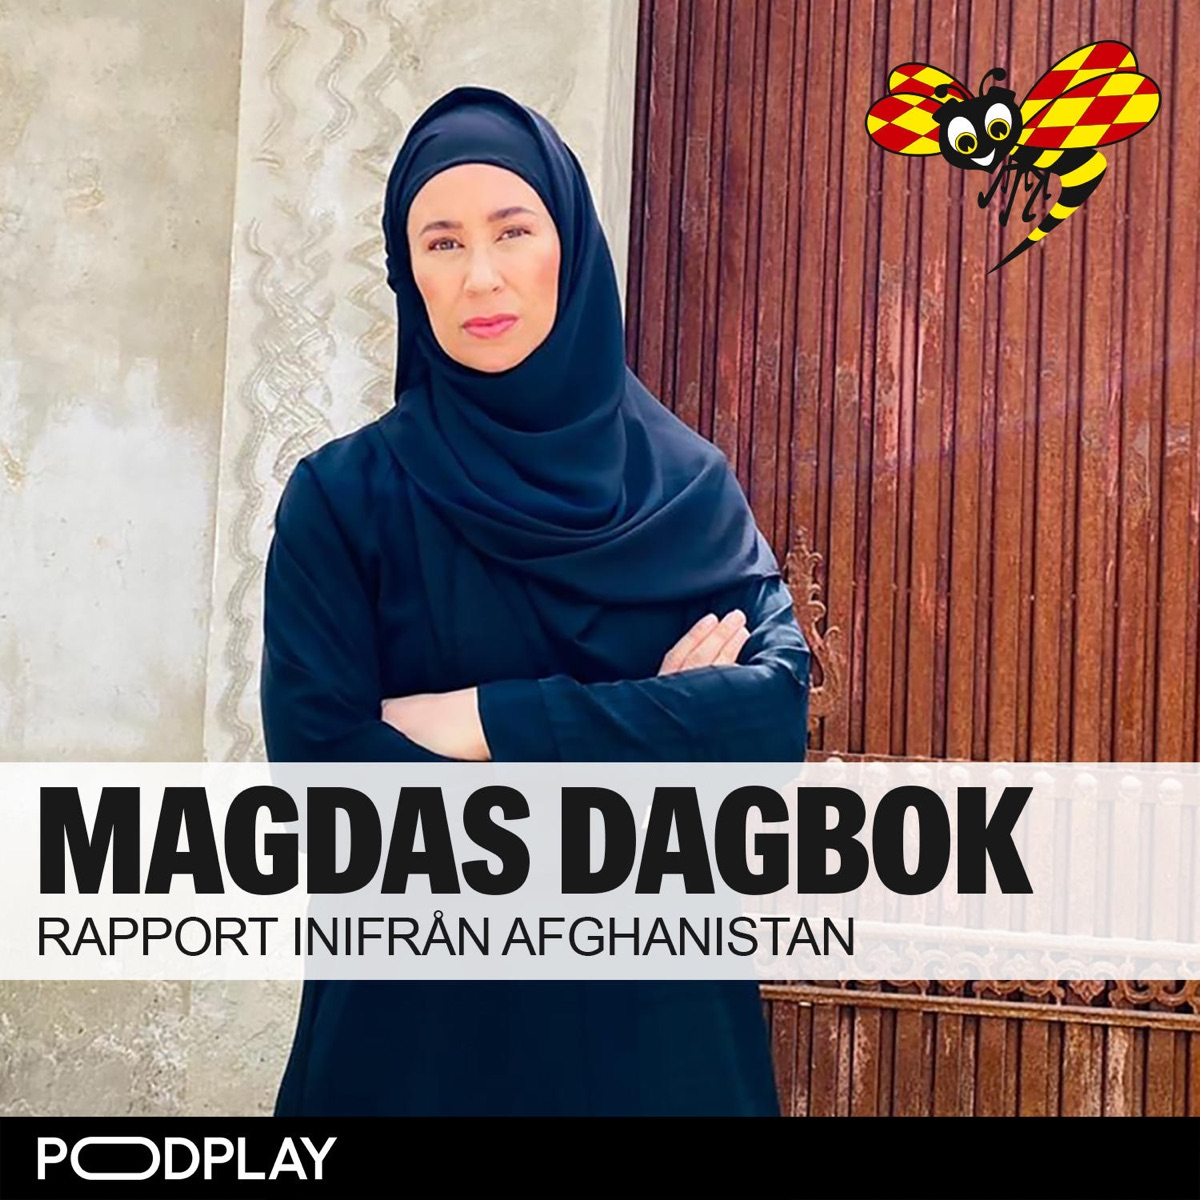 TRAILER: Magdas dagbok - rapport inifrån Afghanistan